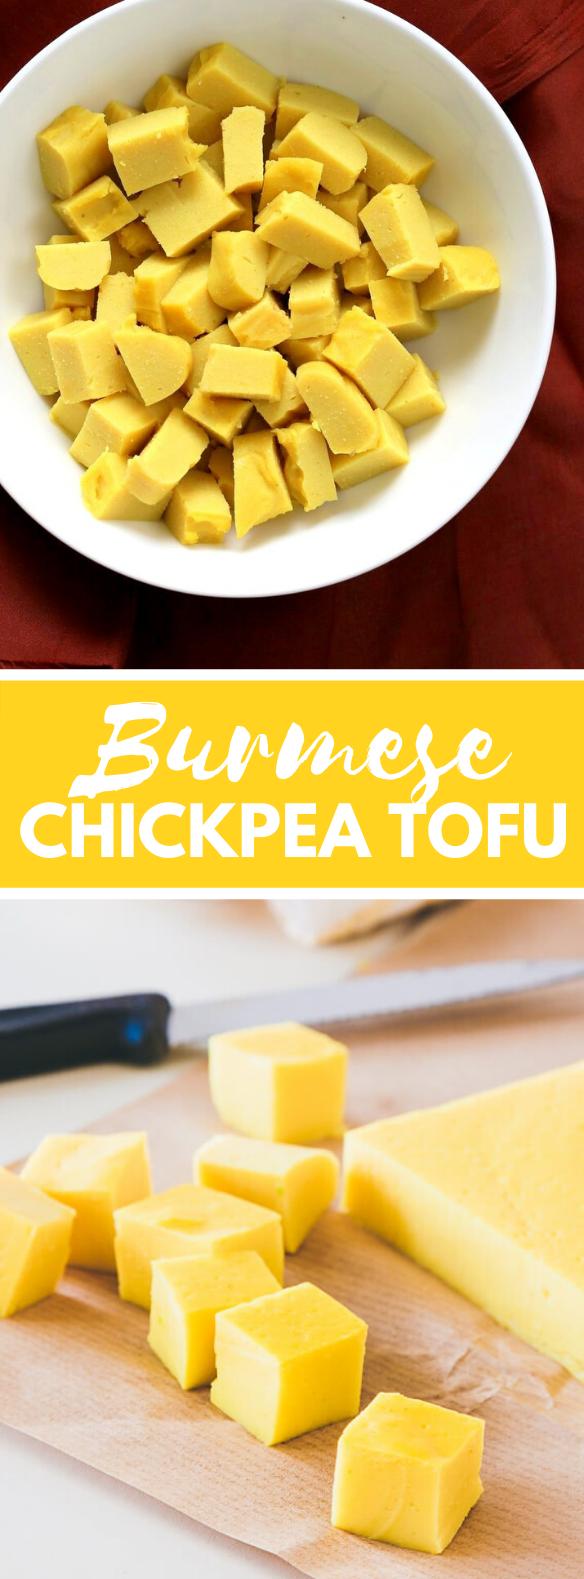 Burmese Chickpea Tofu recipe {vegan + dairy free + gluten free} #homemade #vegetarian